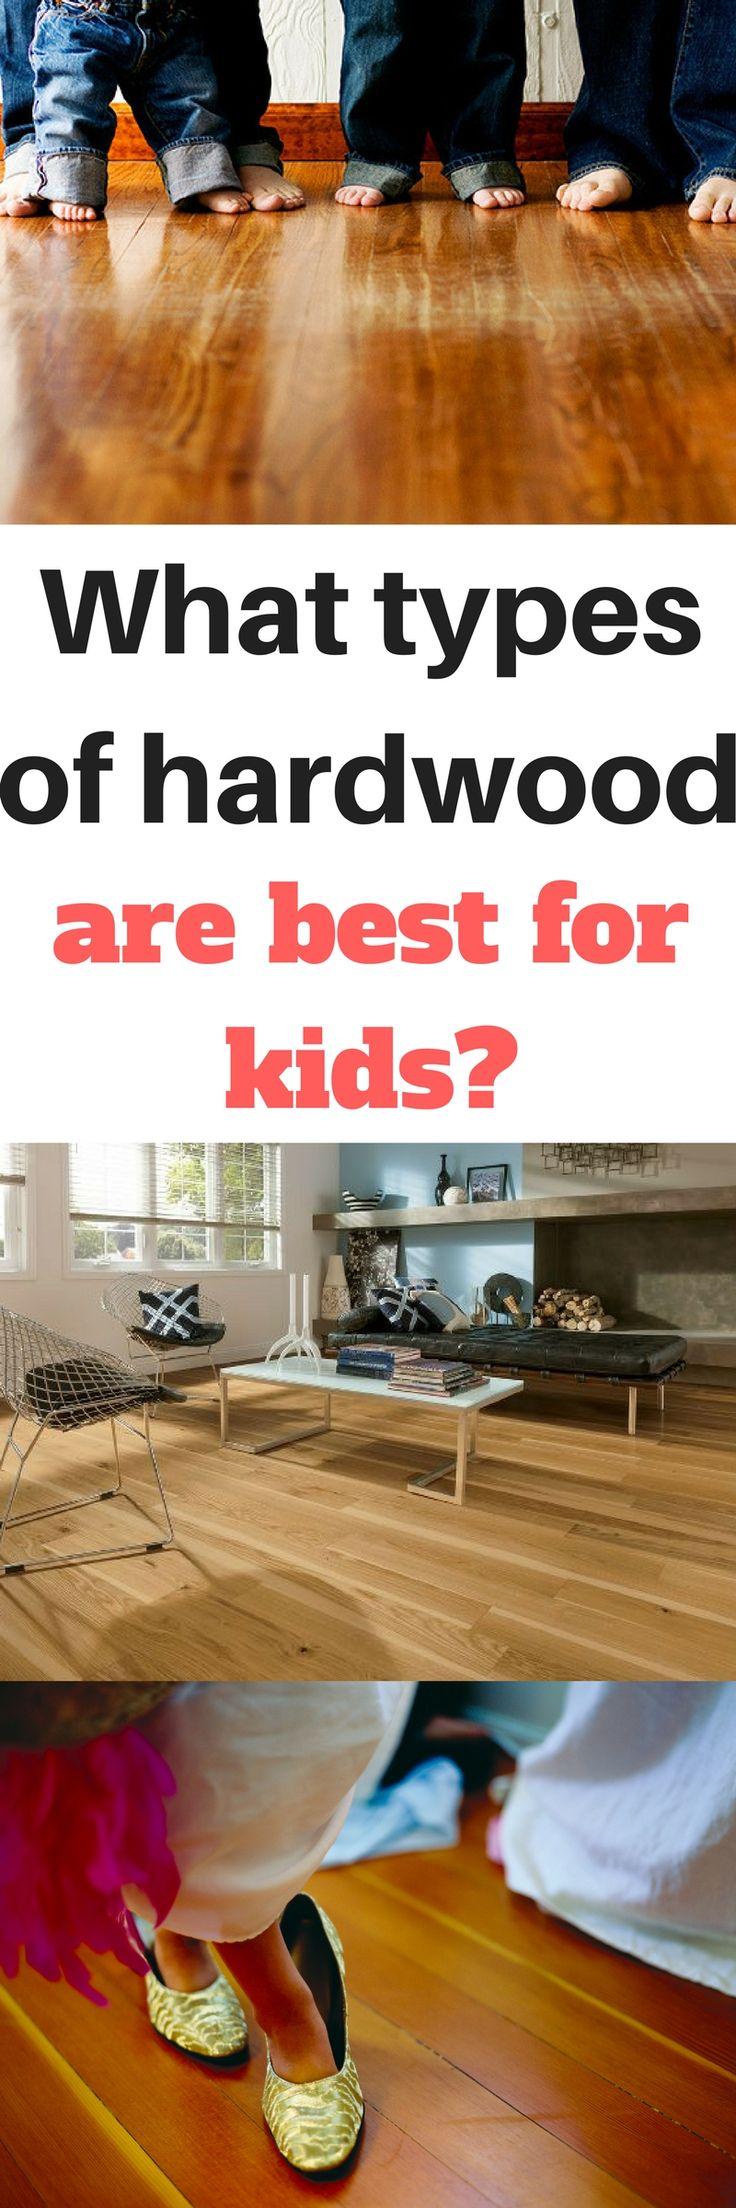 37 best Floors images on Pinterest | Home ideas, Bathroom and ...